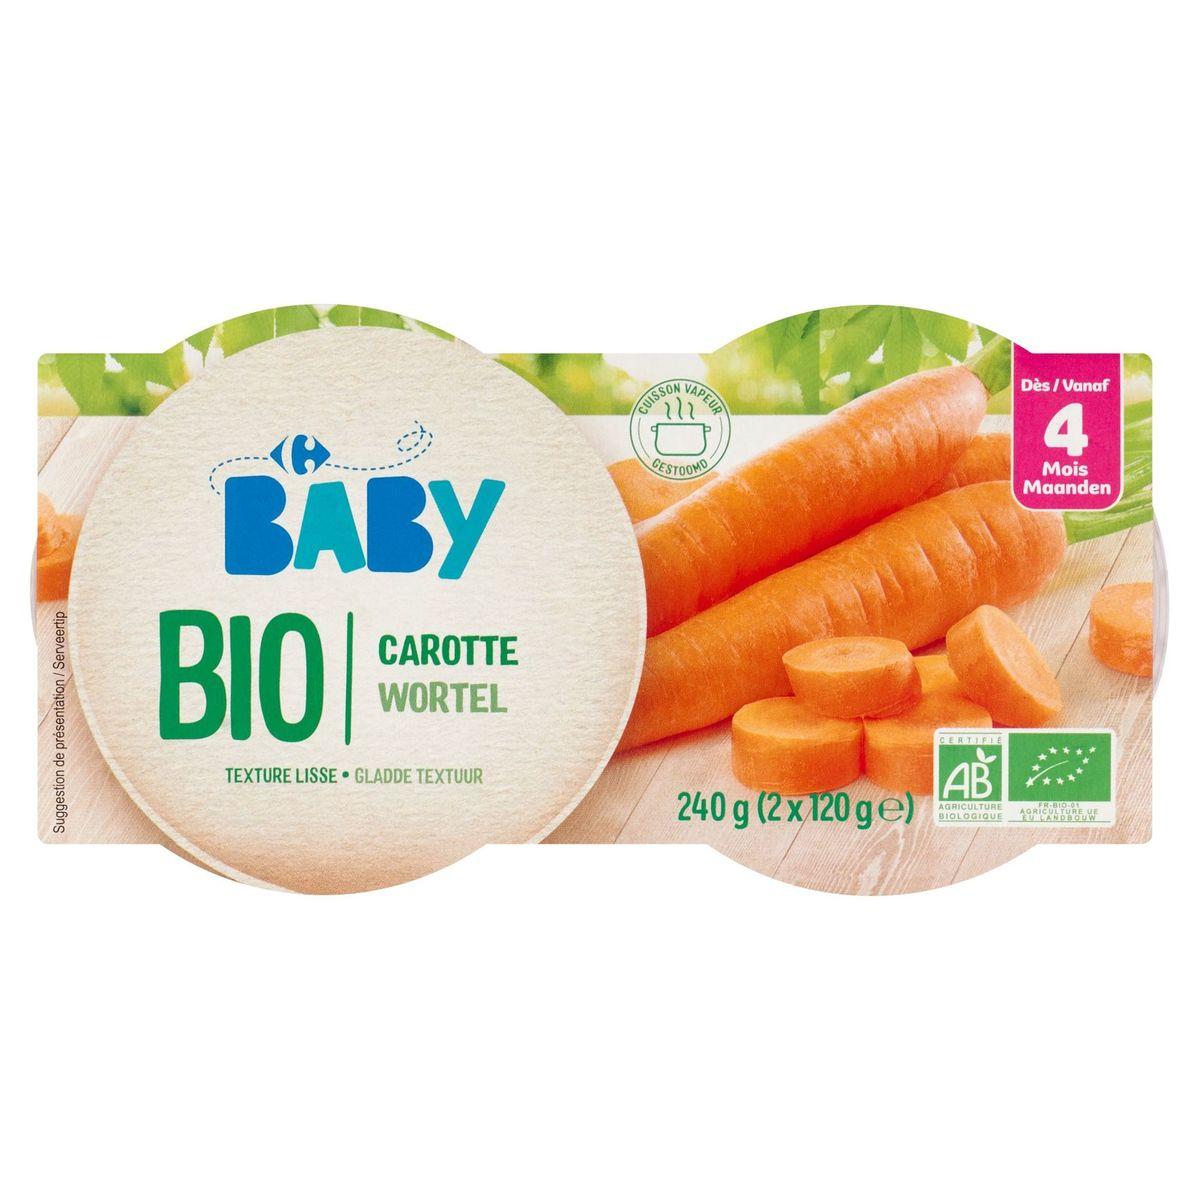 Carrefour Baby Bio Carotte dès 4 Mois 2 x 120 g